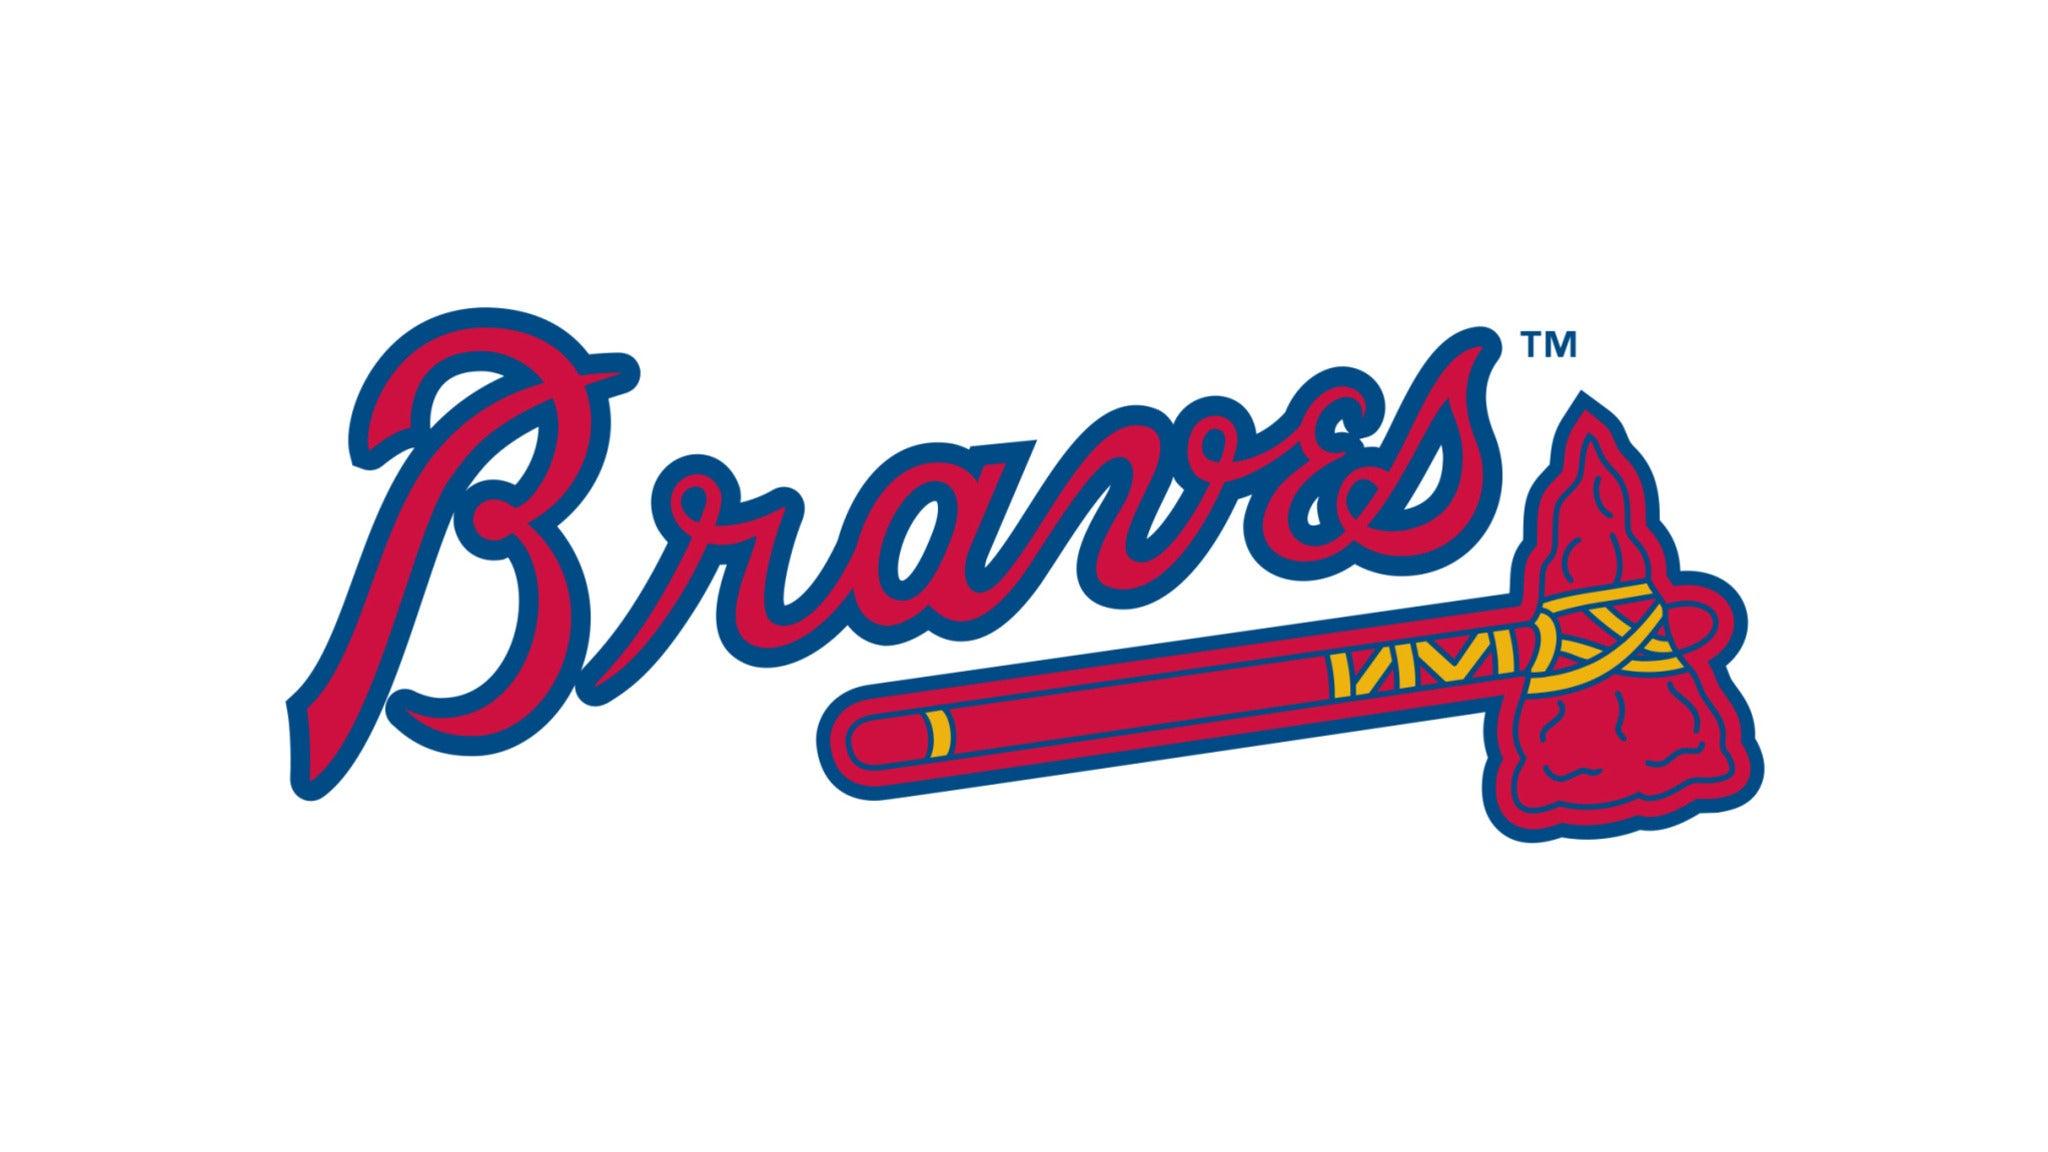 Atlanta Braves v Detroit Tigers at Turner Field